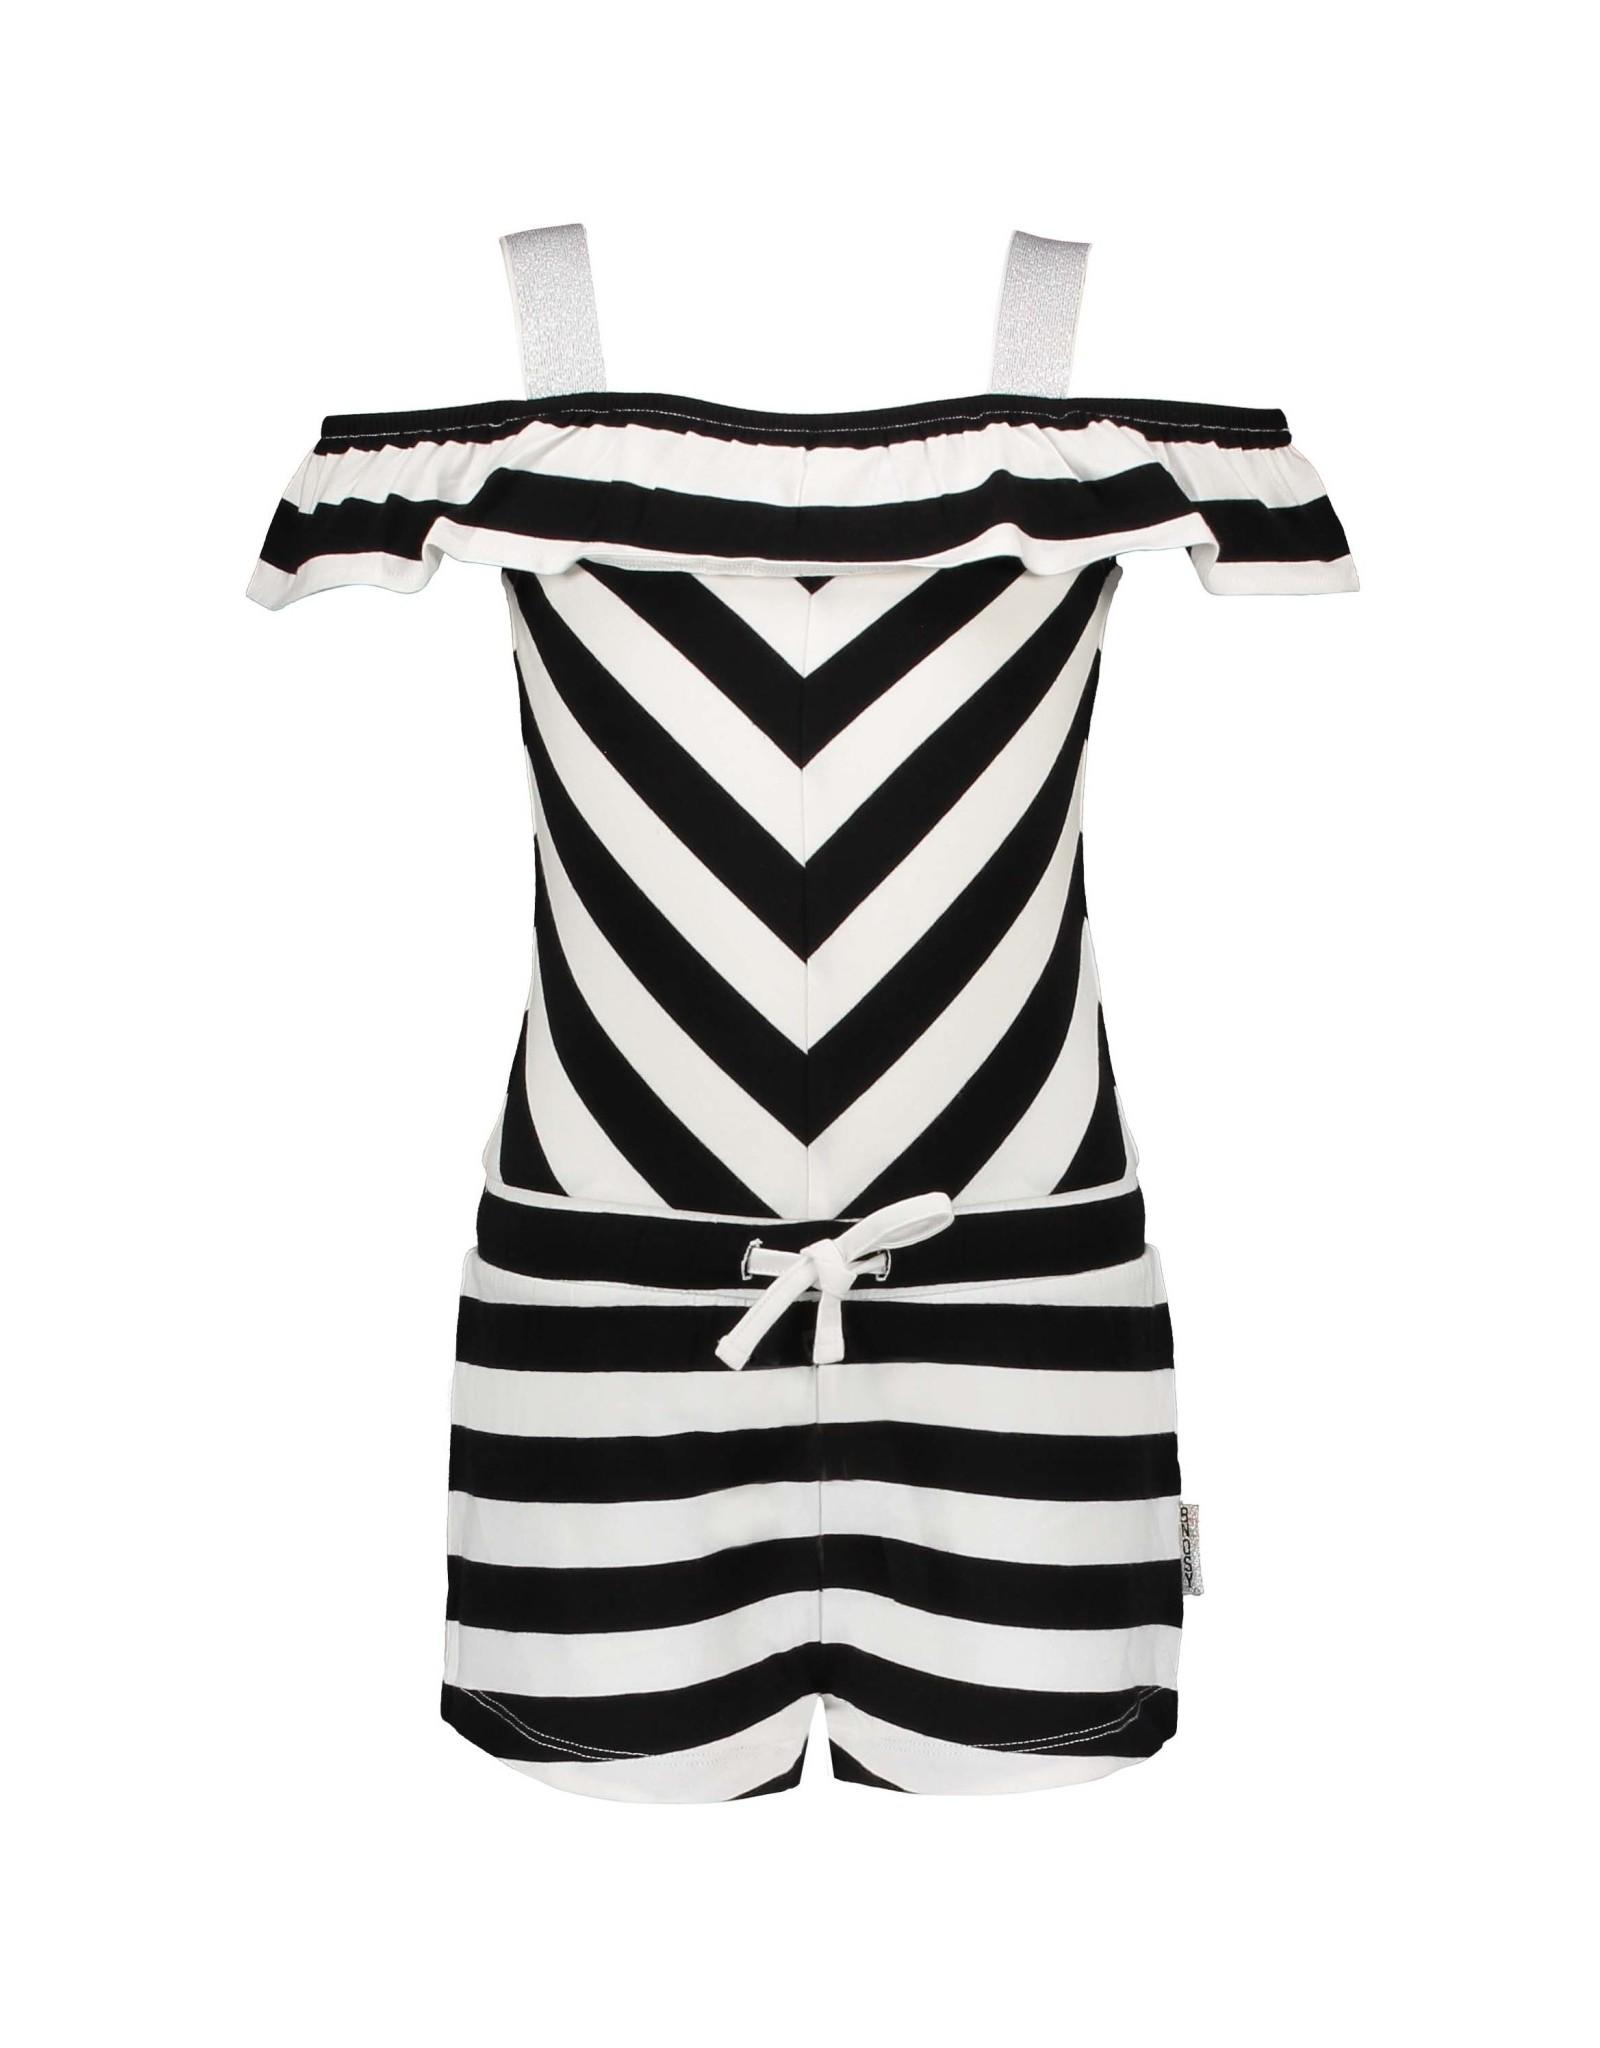 B.Nosy B.Nosy meisjes jumpsuit Cheer Black White Stripe